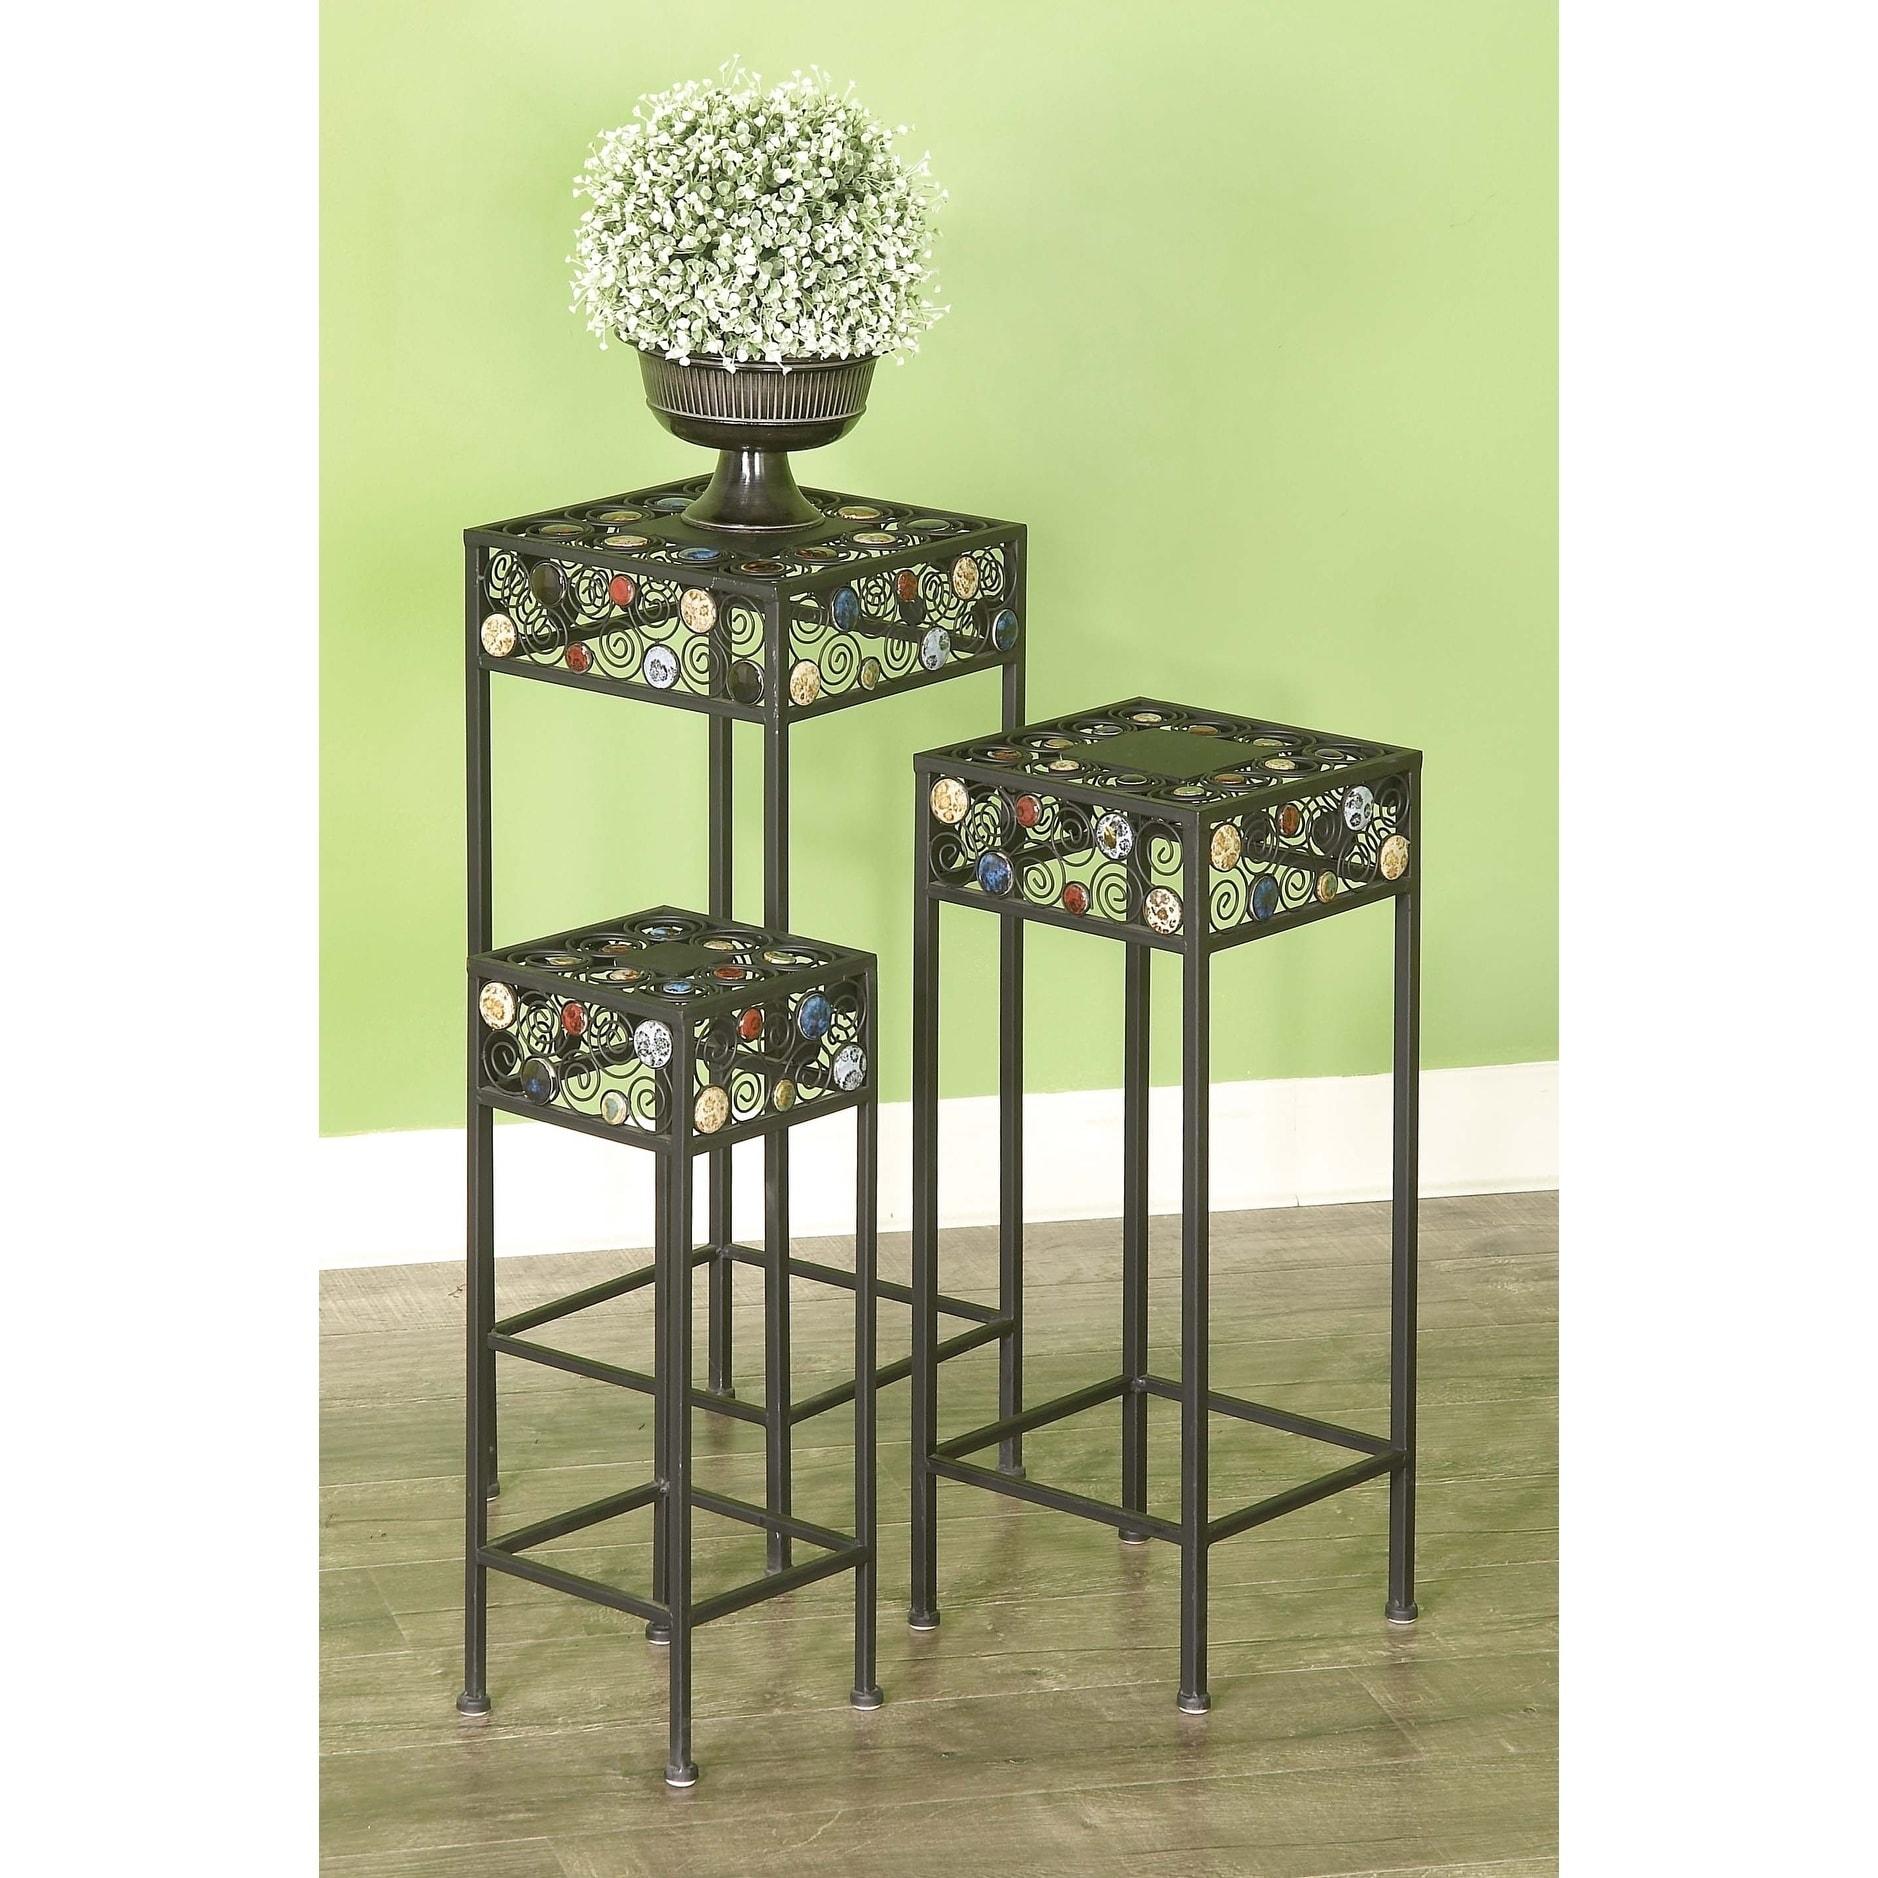 20 Inch Metal Ceramic Plant Stand